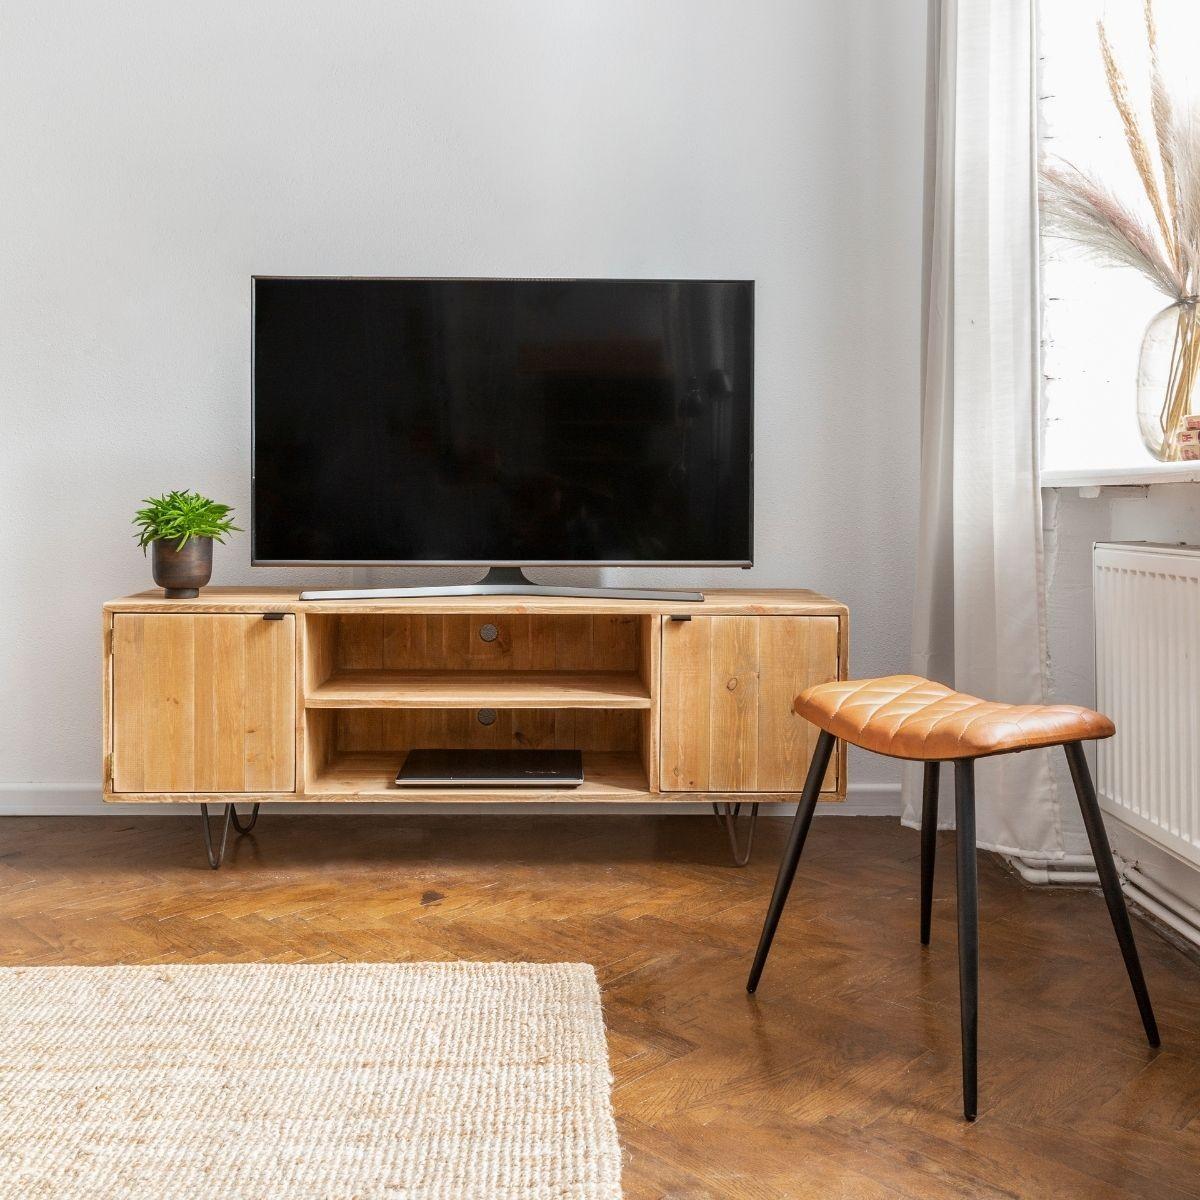 Meuble TV 2 portes pin massif pied acier bois vieilli